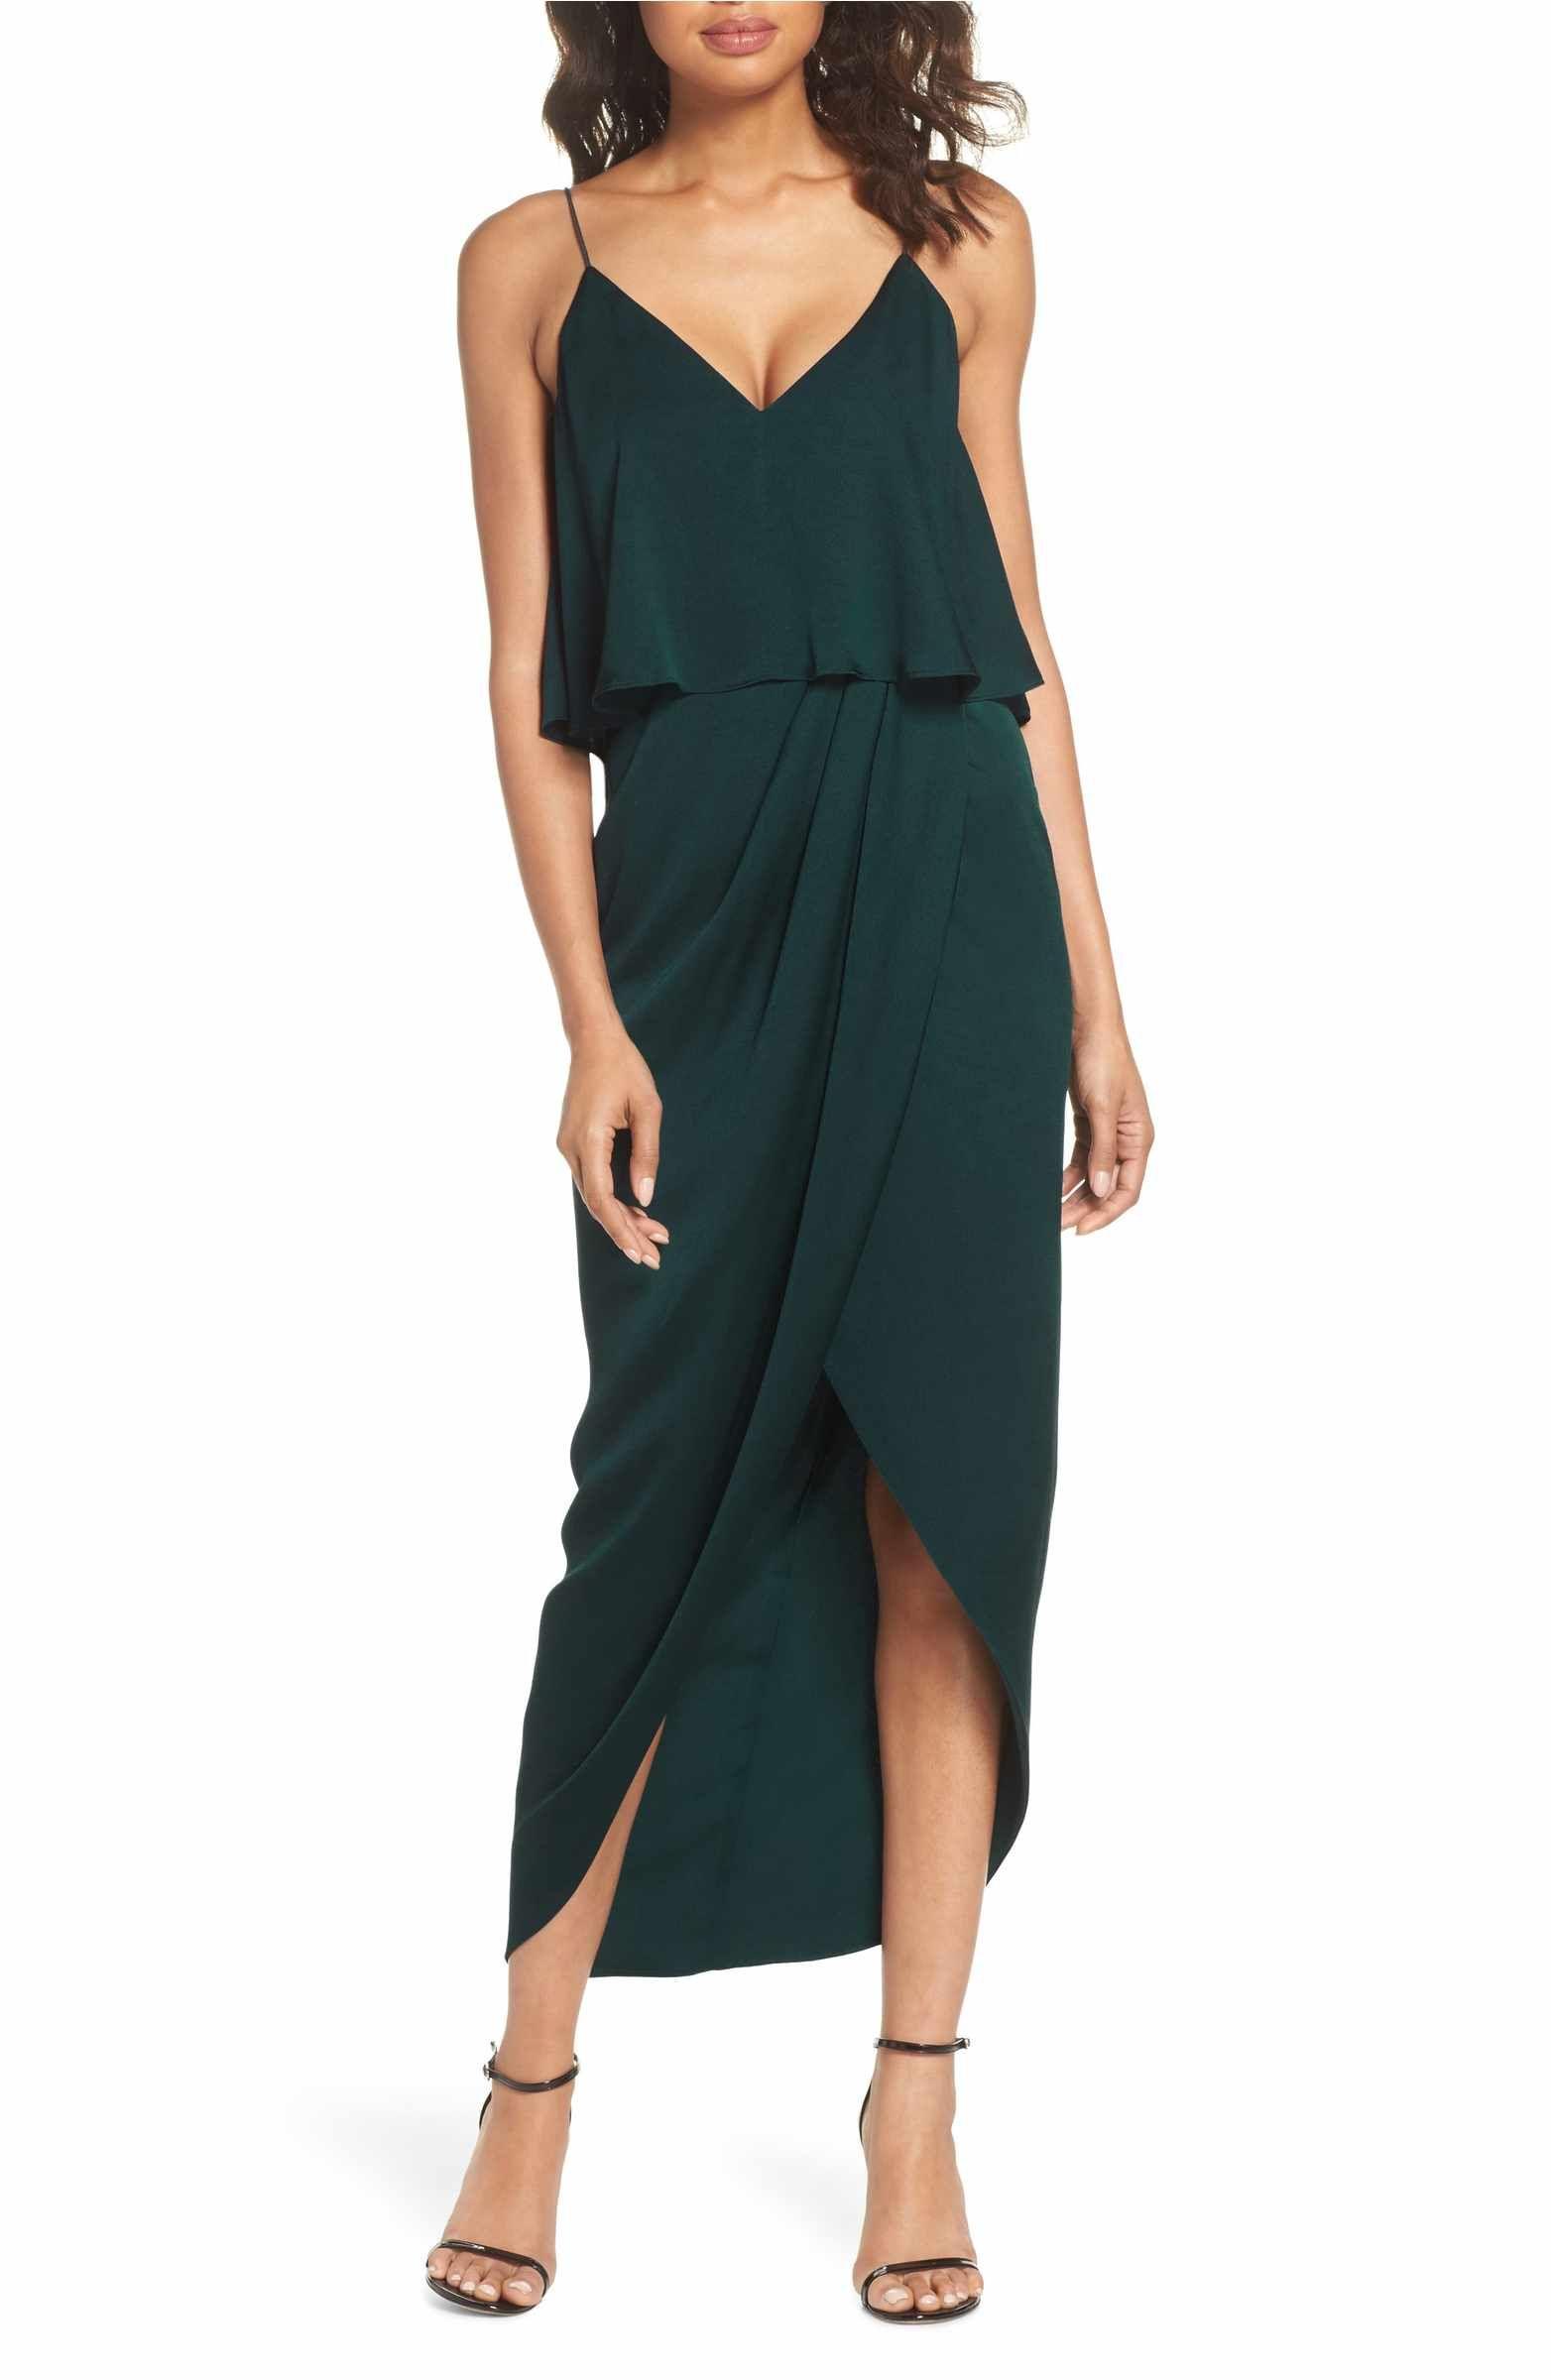 047d1fddfe8 Main Image - Shona Joy Luxe Frill Tulip Hem Maxi Dress